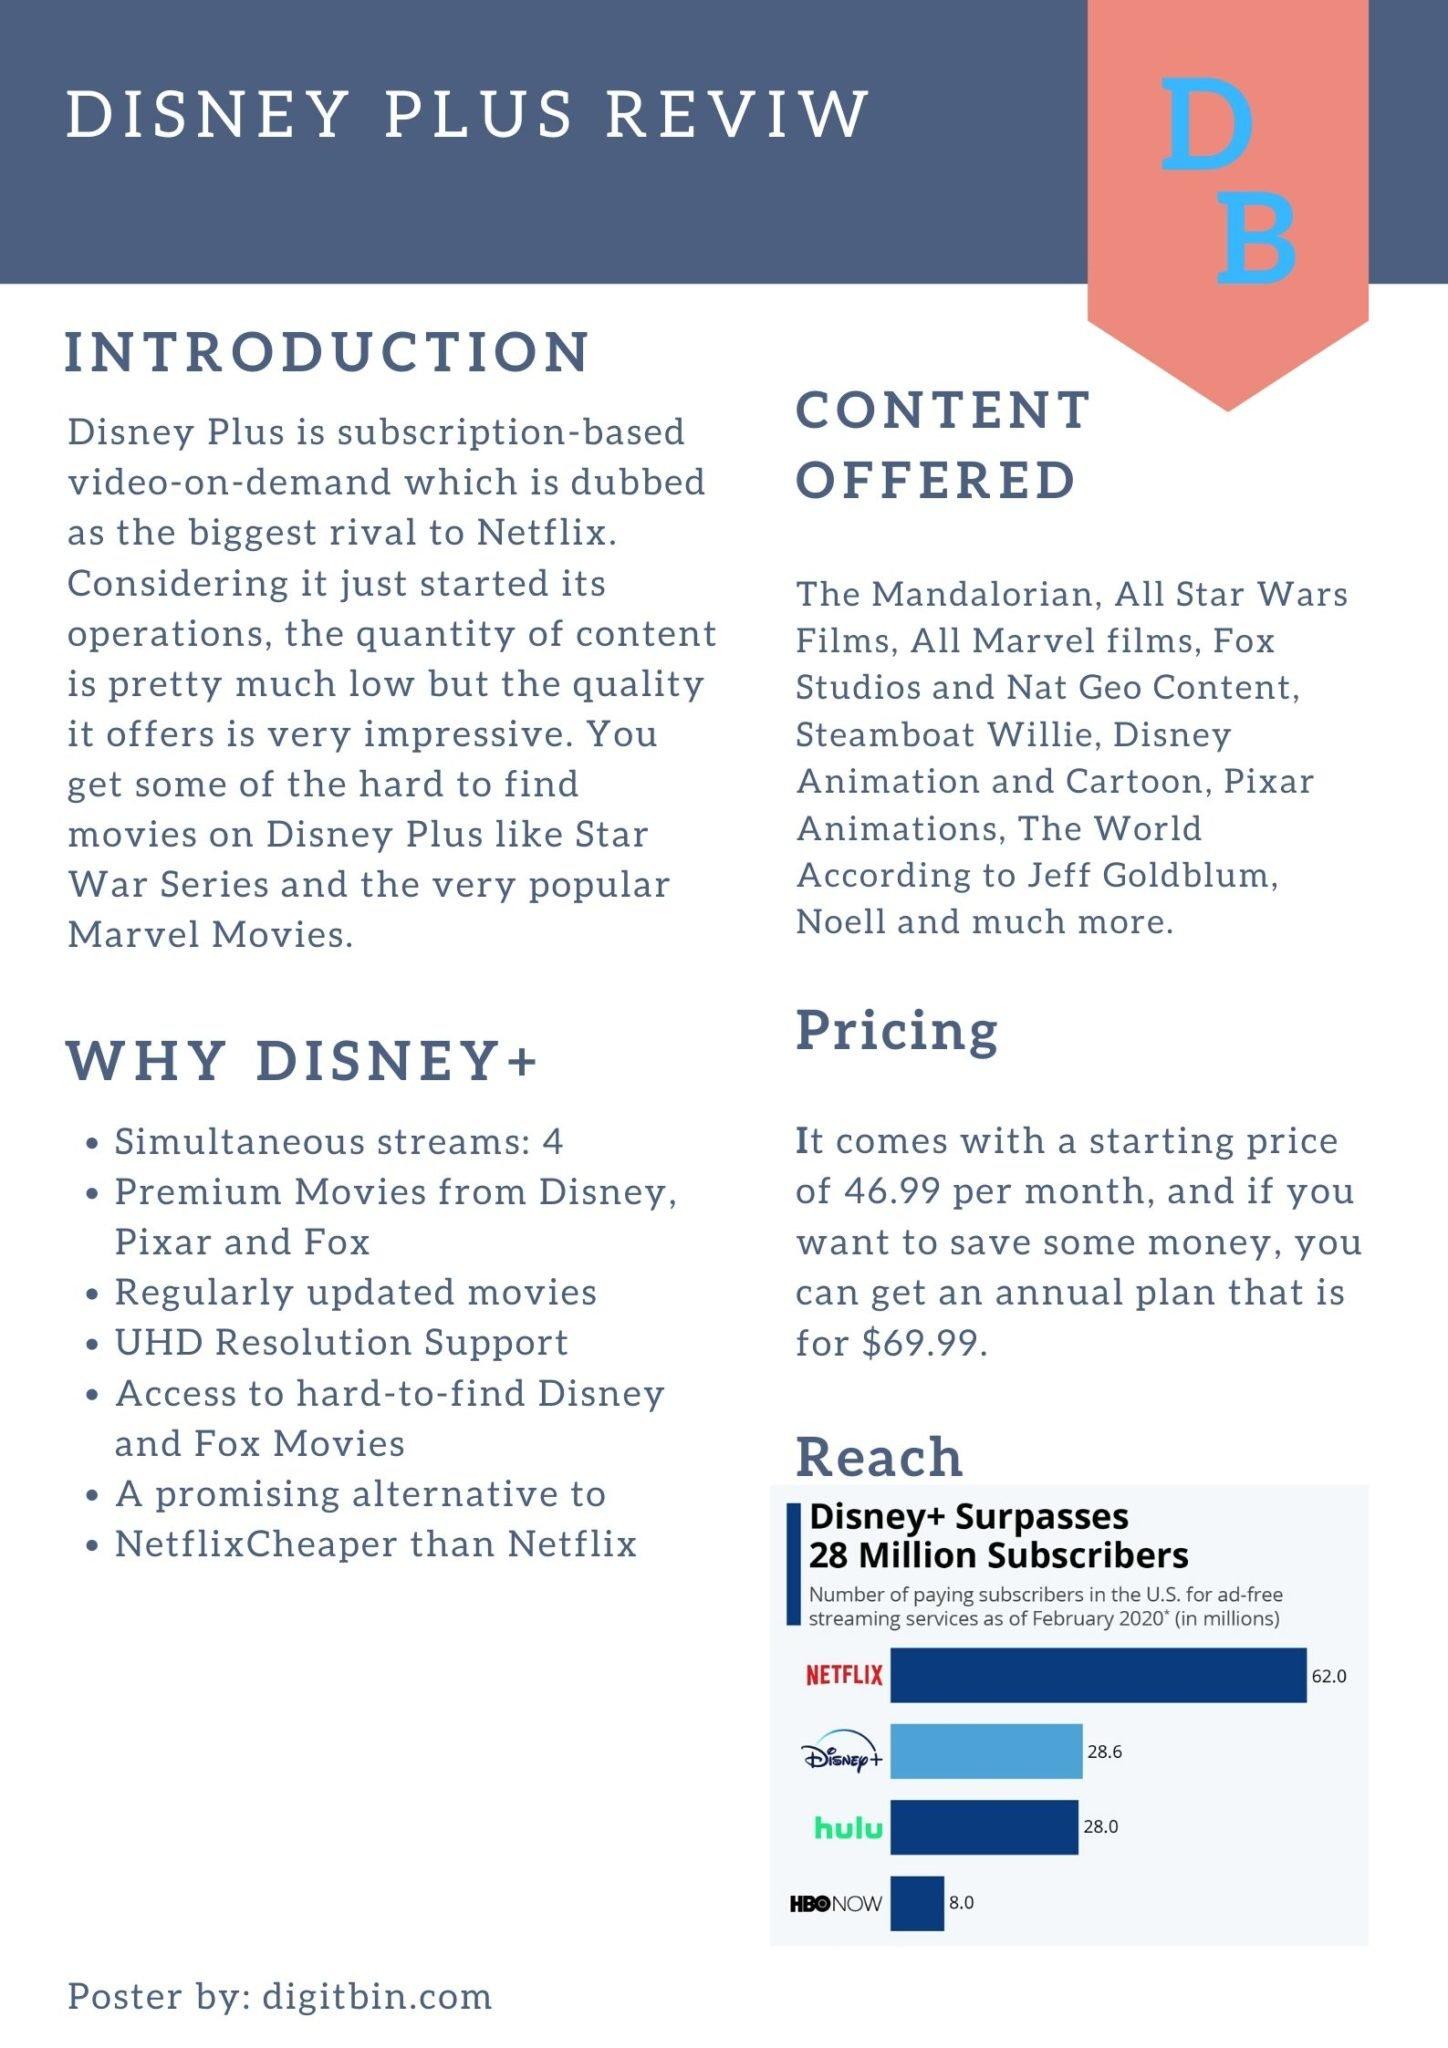 Disney+ Review Poster